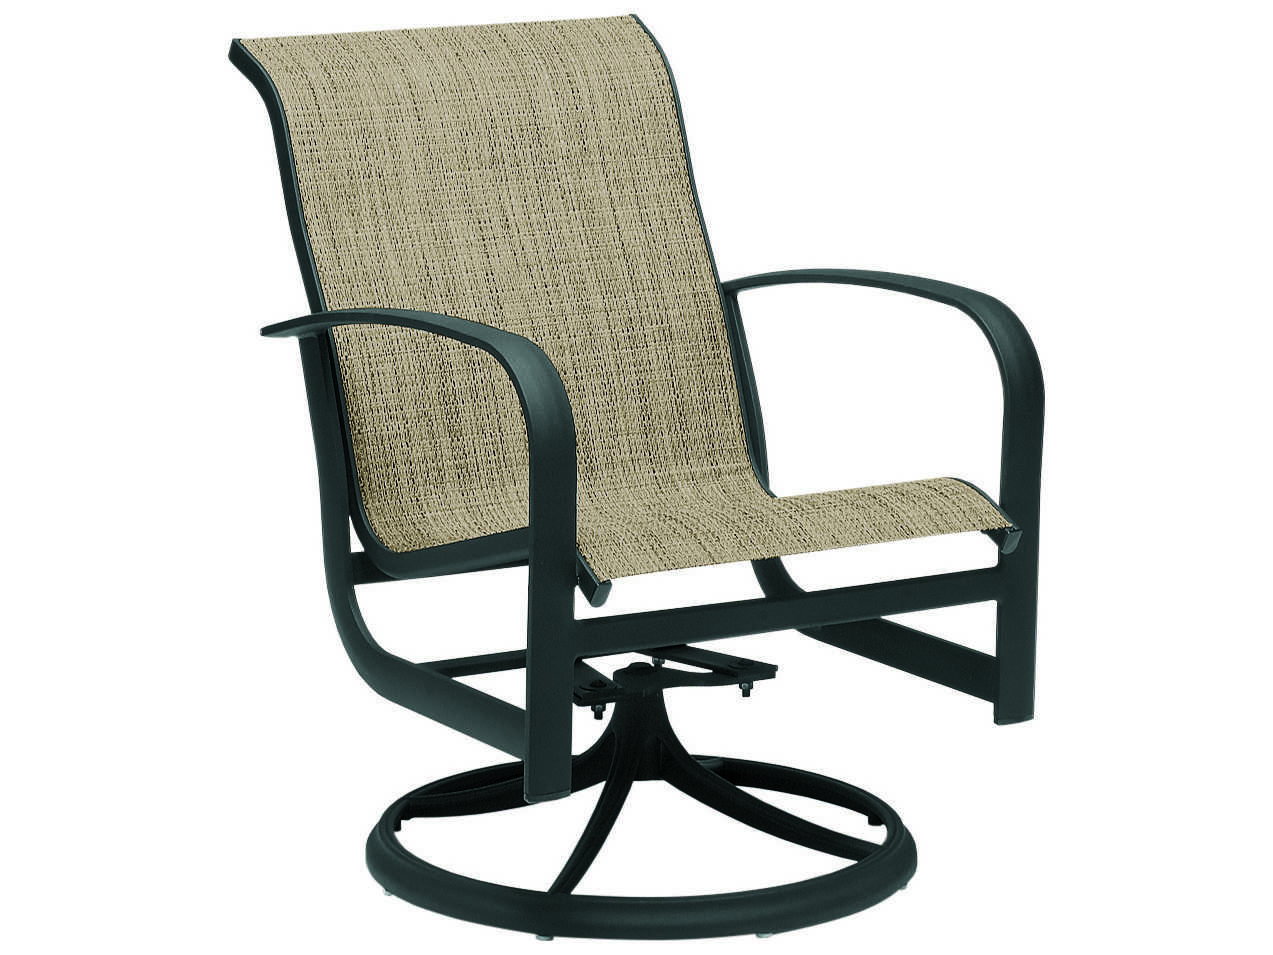 sling motion patio chairs hanging outdoor furniture woodard fremont aluminum swivel rocker wr2p0472